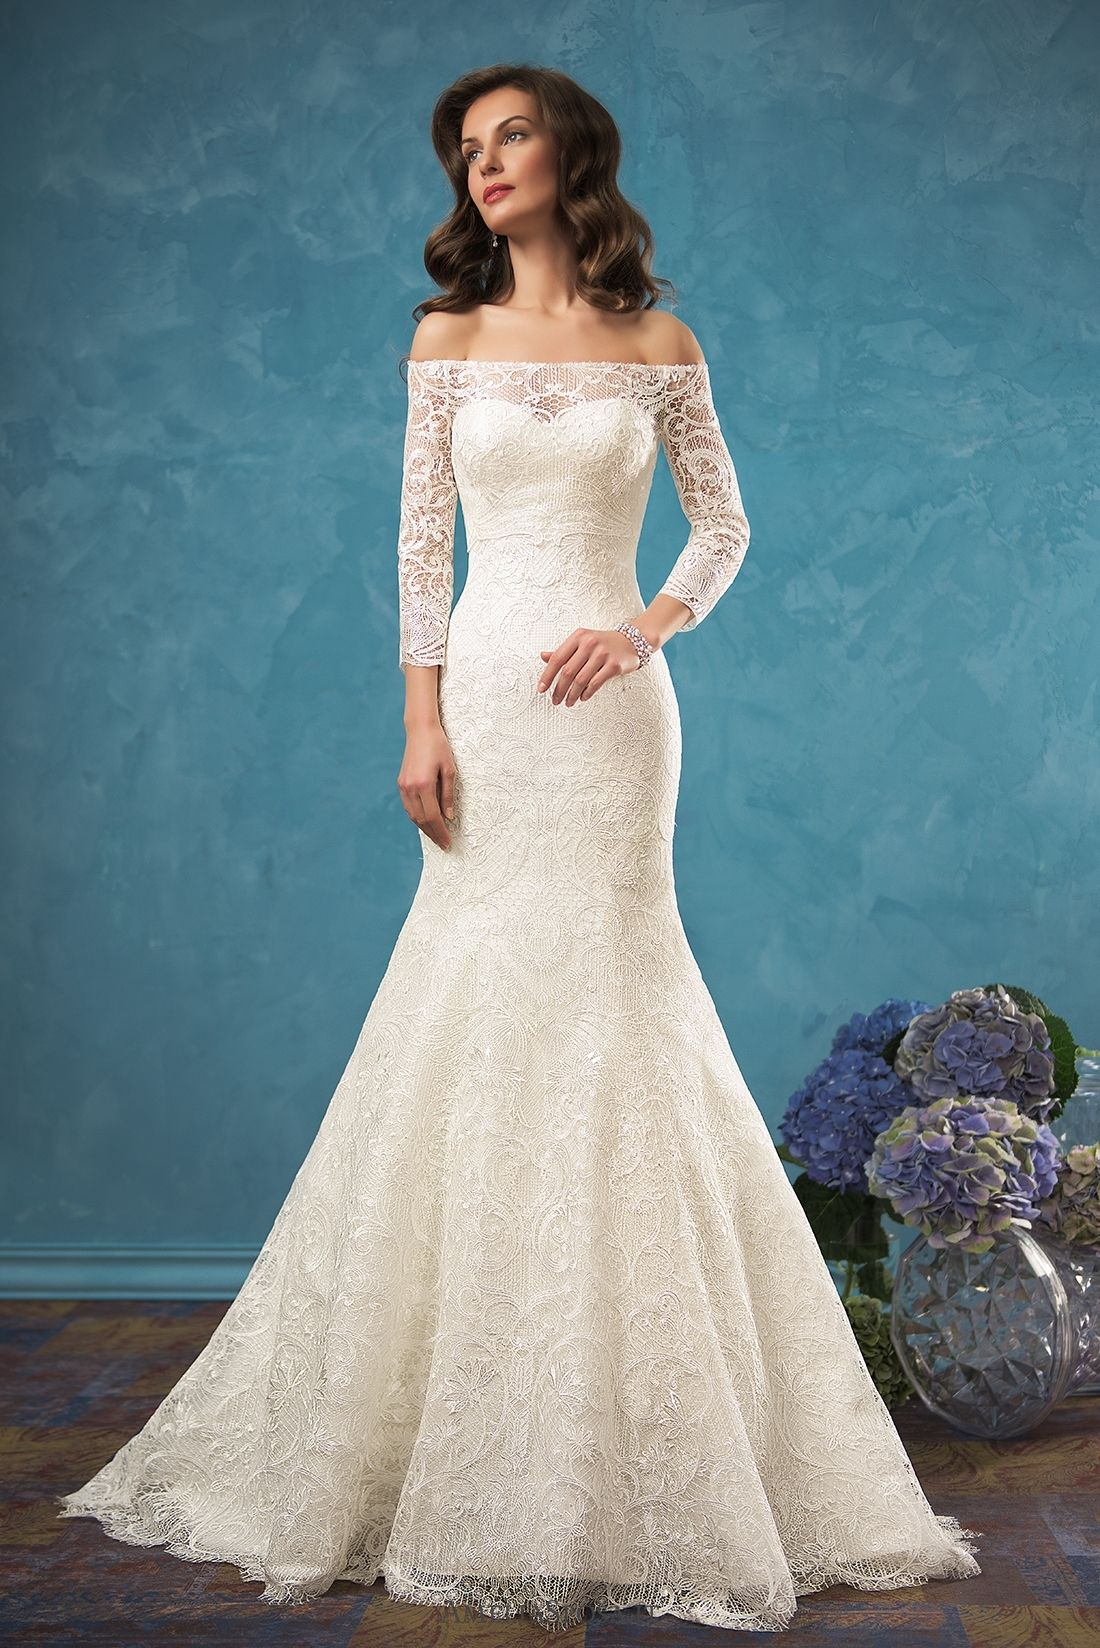 Wedding dress Celia   wedding dresses   Pinterest   Eventos y Boda